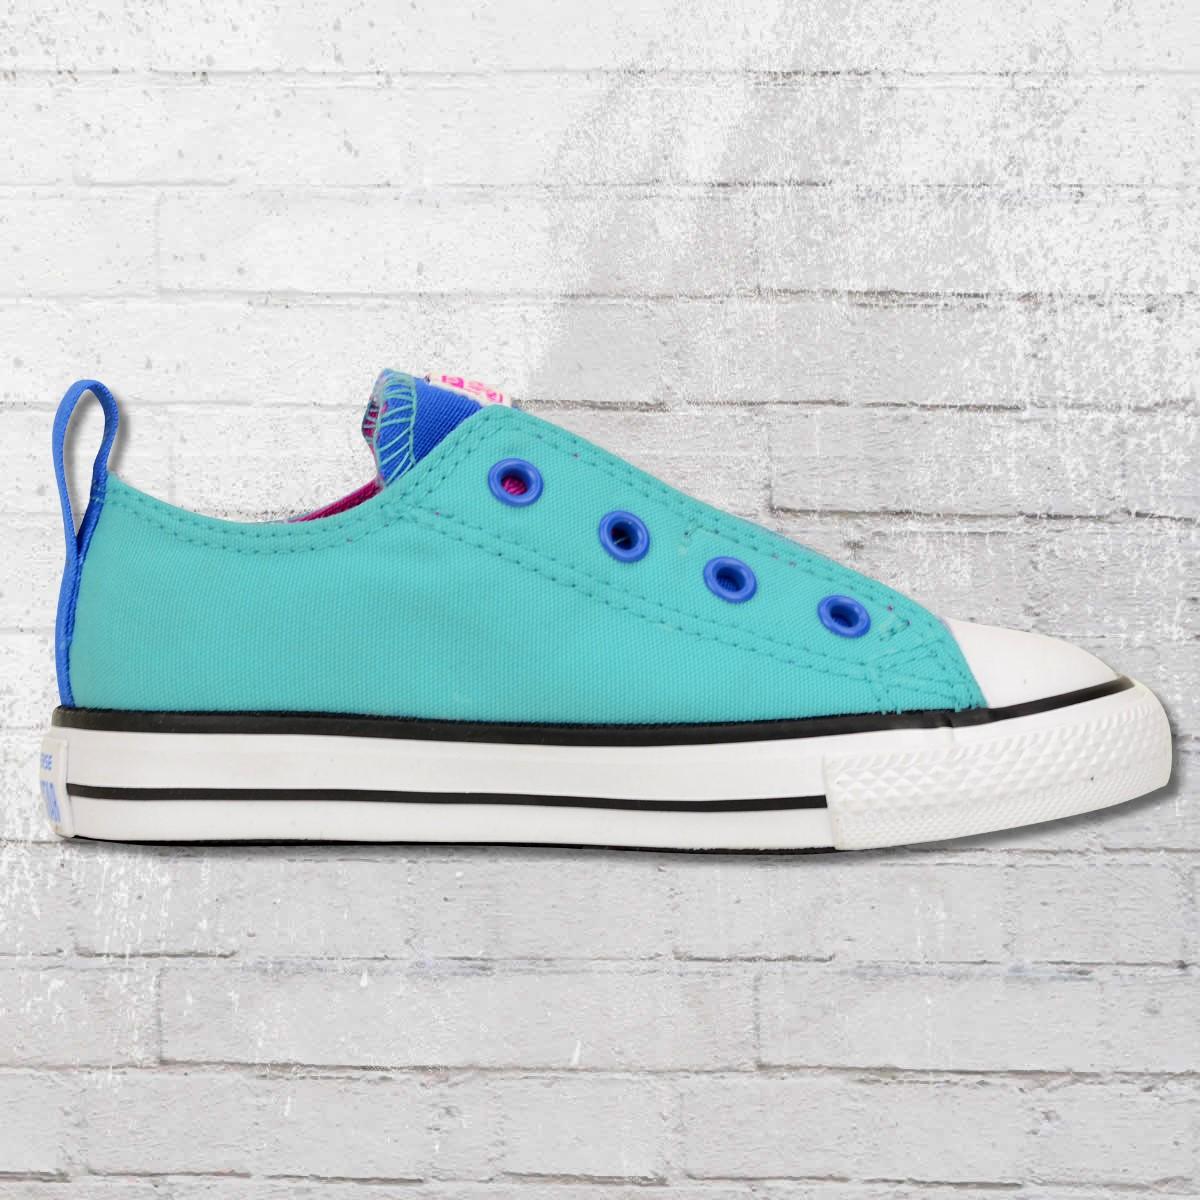 new product a8428 d0721 Jetzt bestellen   Converse Simple Slip Kinder Schuhe blau ...